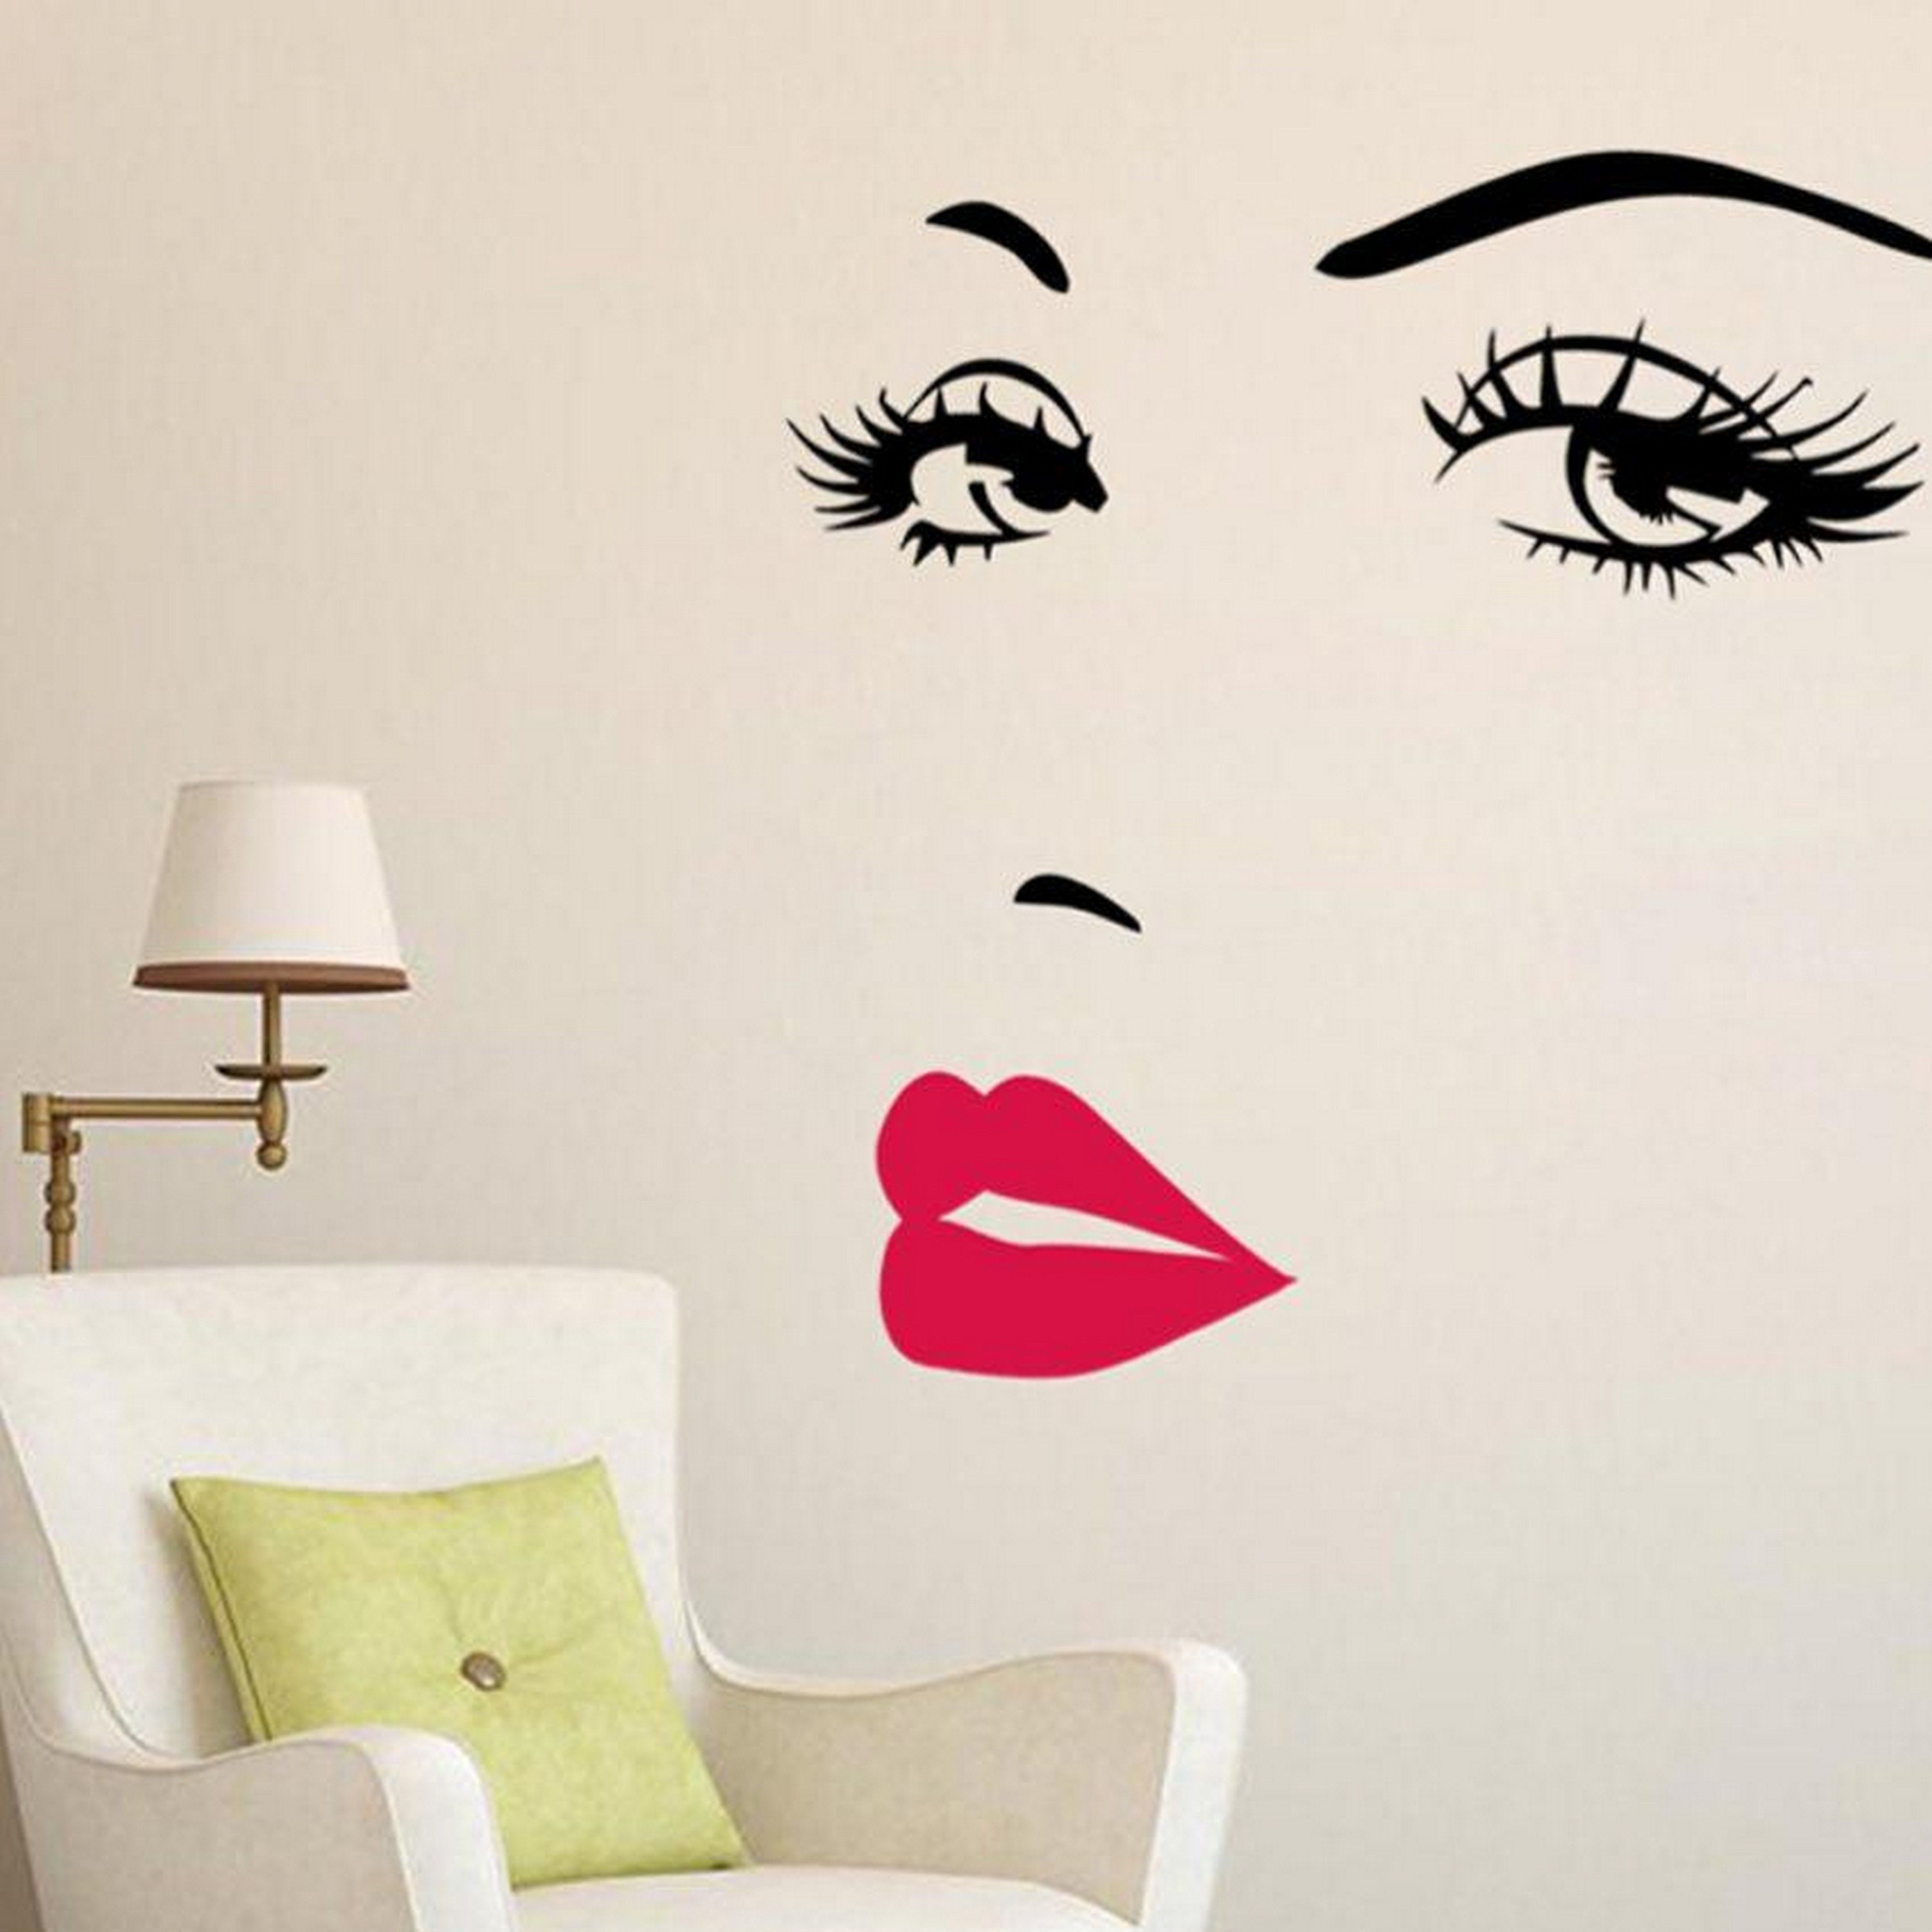 Pin By Dina Manda Sari On Homemade Wall Decoration Ideas For Bedroom